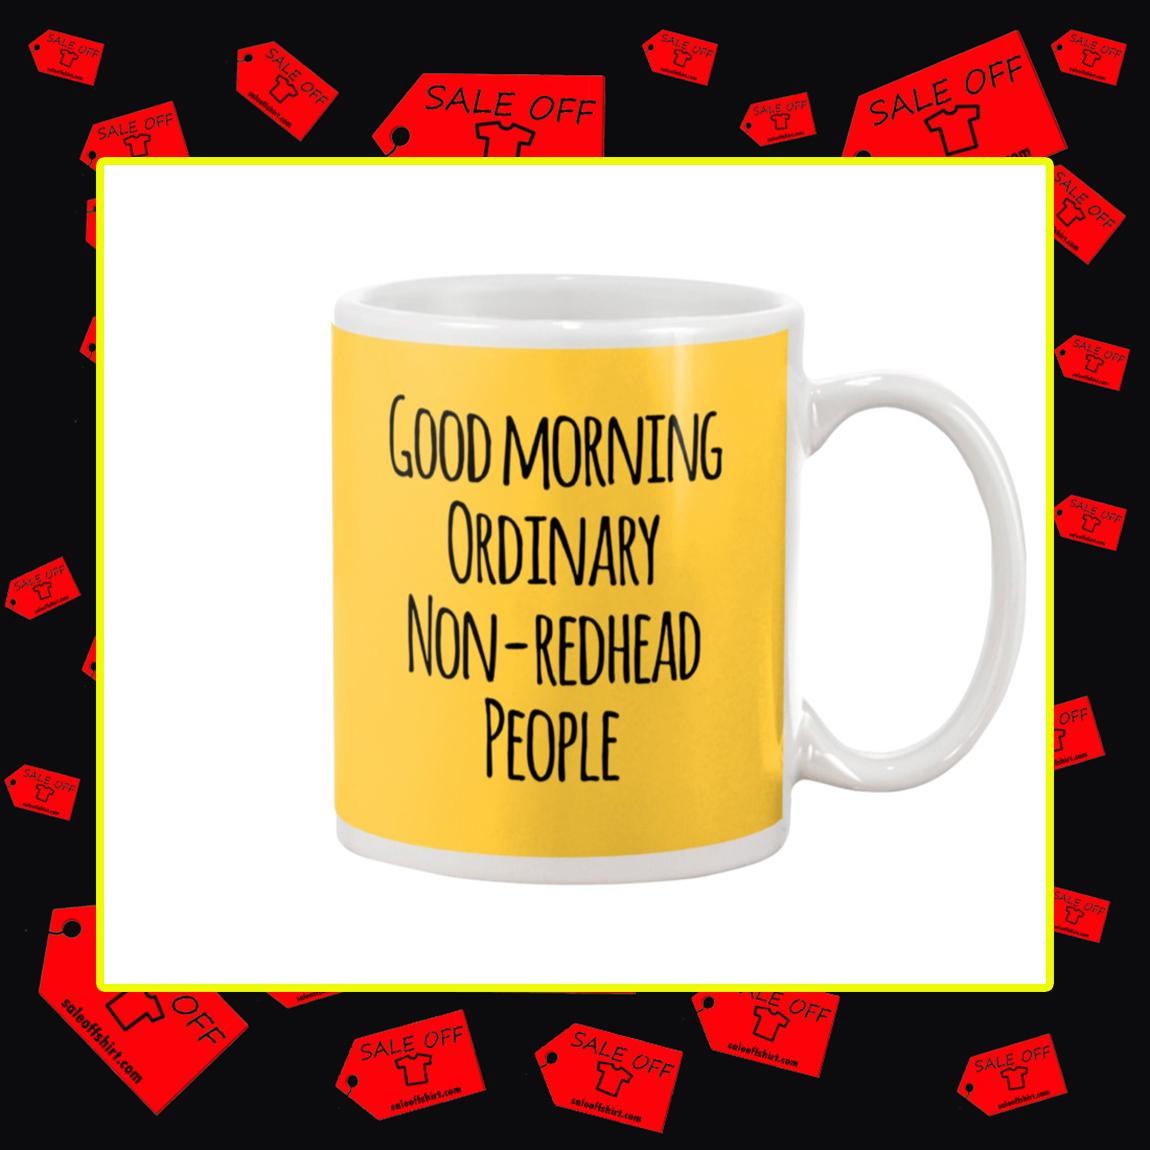 Good Morning Ordinary Non-Redhead People Mug- gold